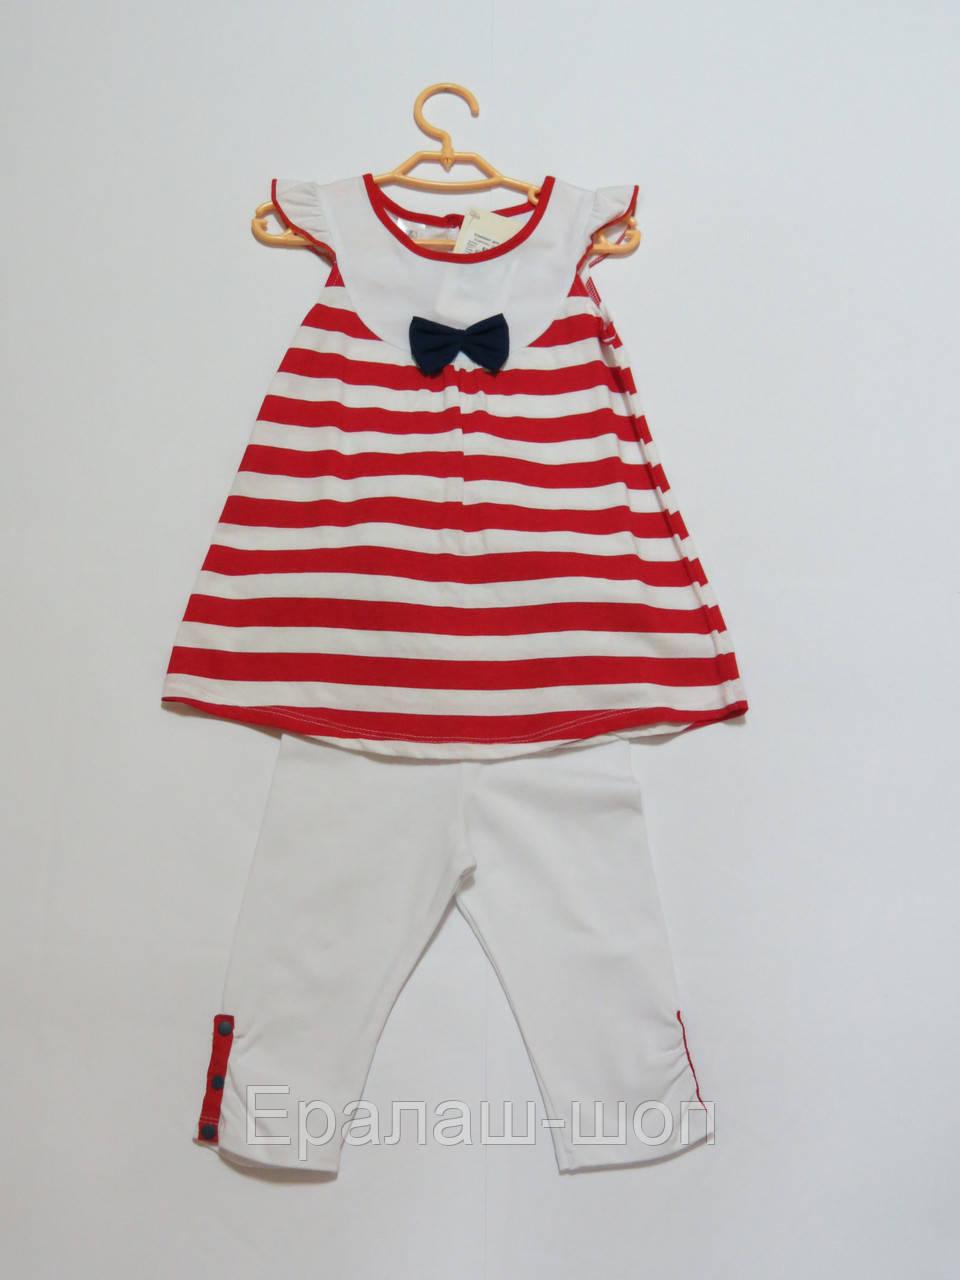 Летний костюм для девочек Украина(туника+лосины) 98р 110р, цена 190 ... 488ffc743fa